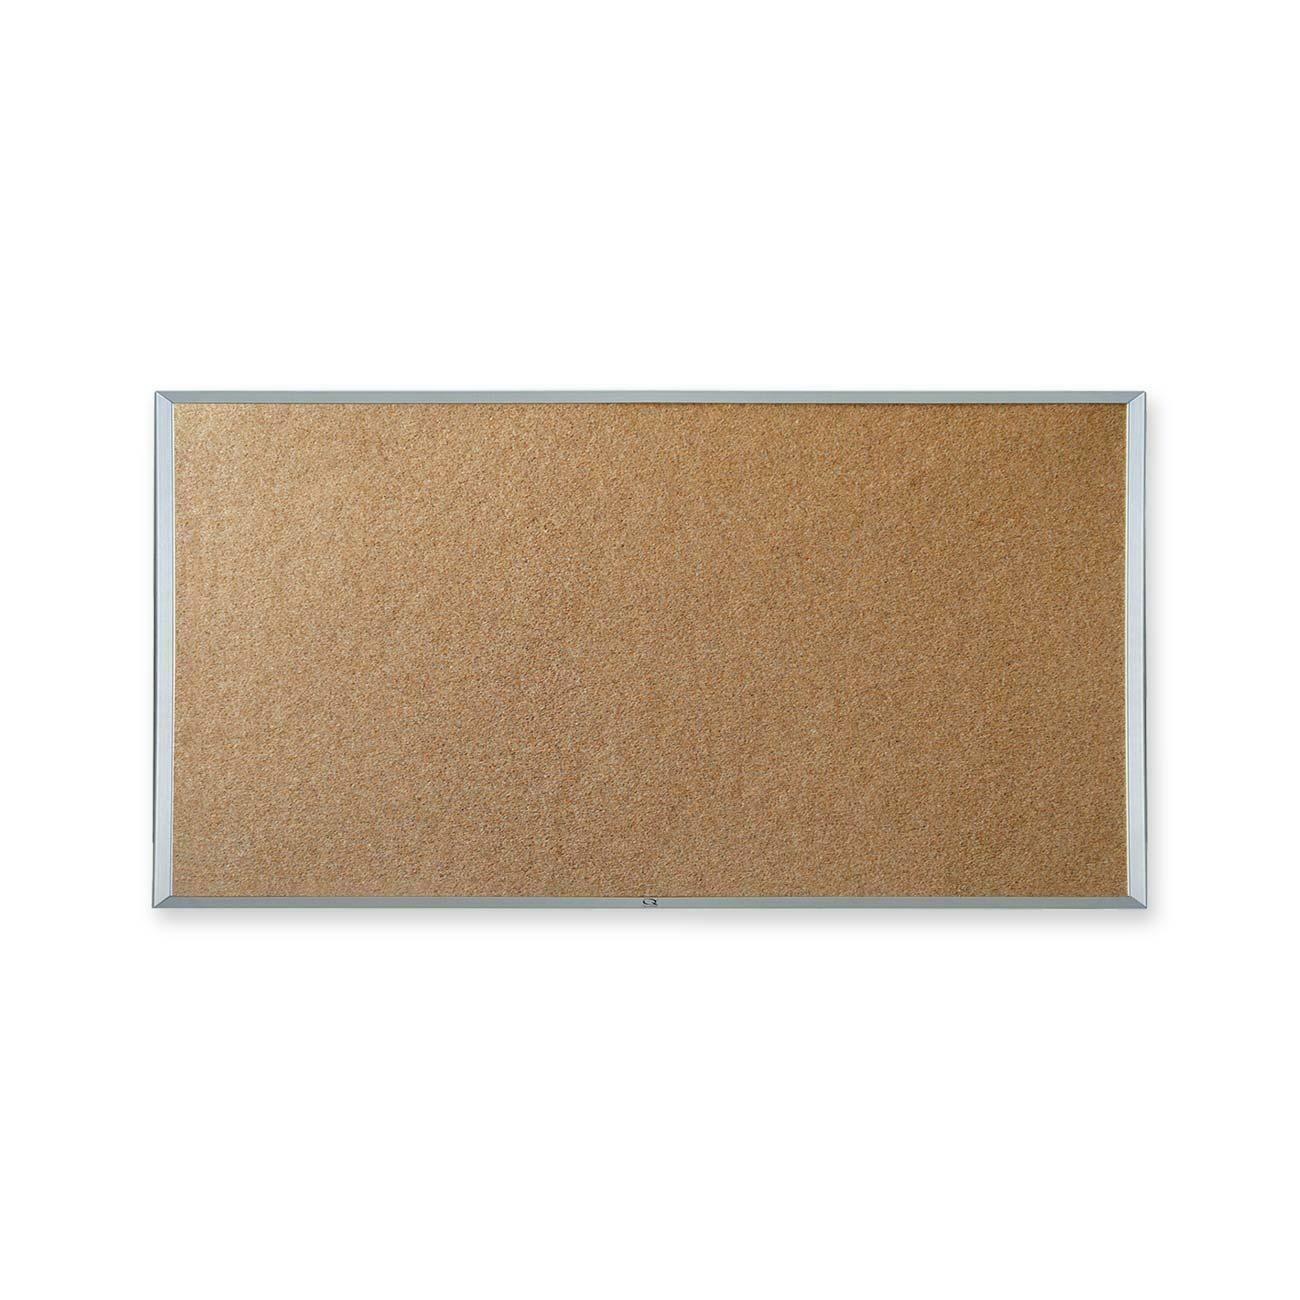 "Corkboard, 18"" x 24"" Aluminum Frame, Quartet"